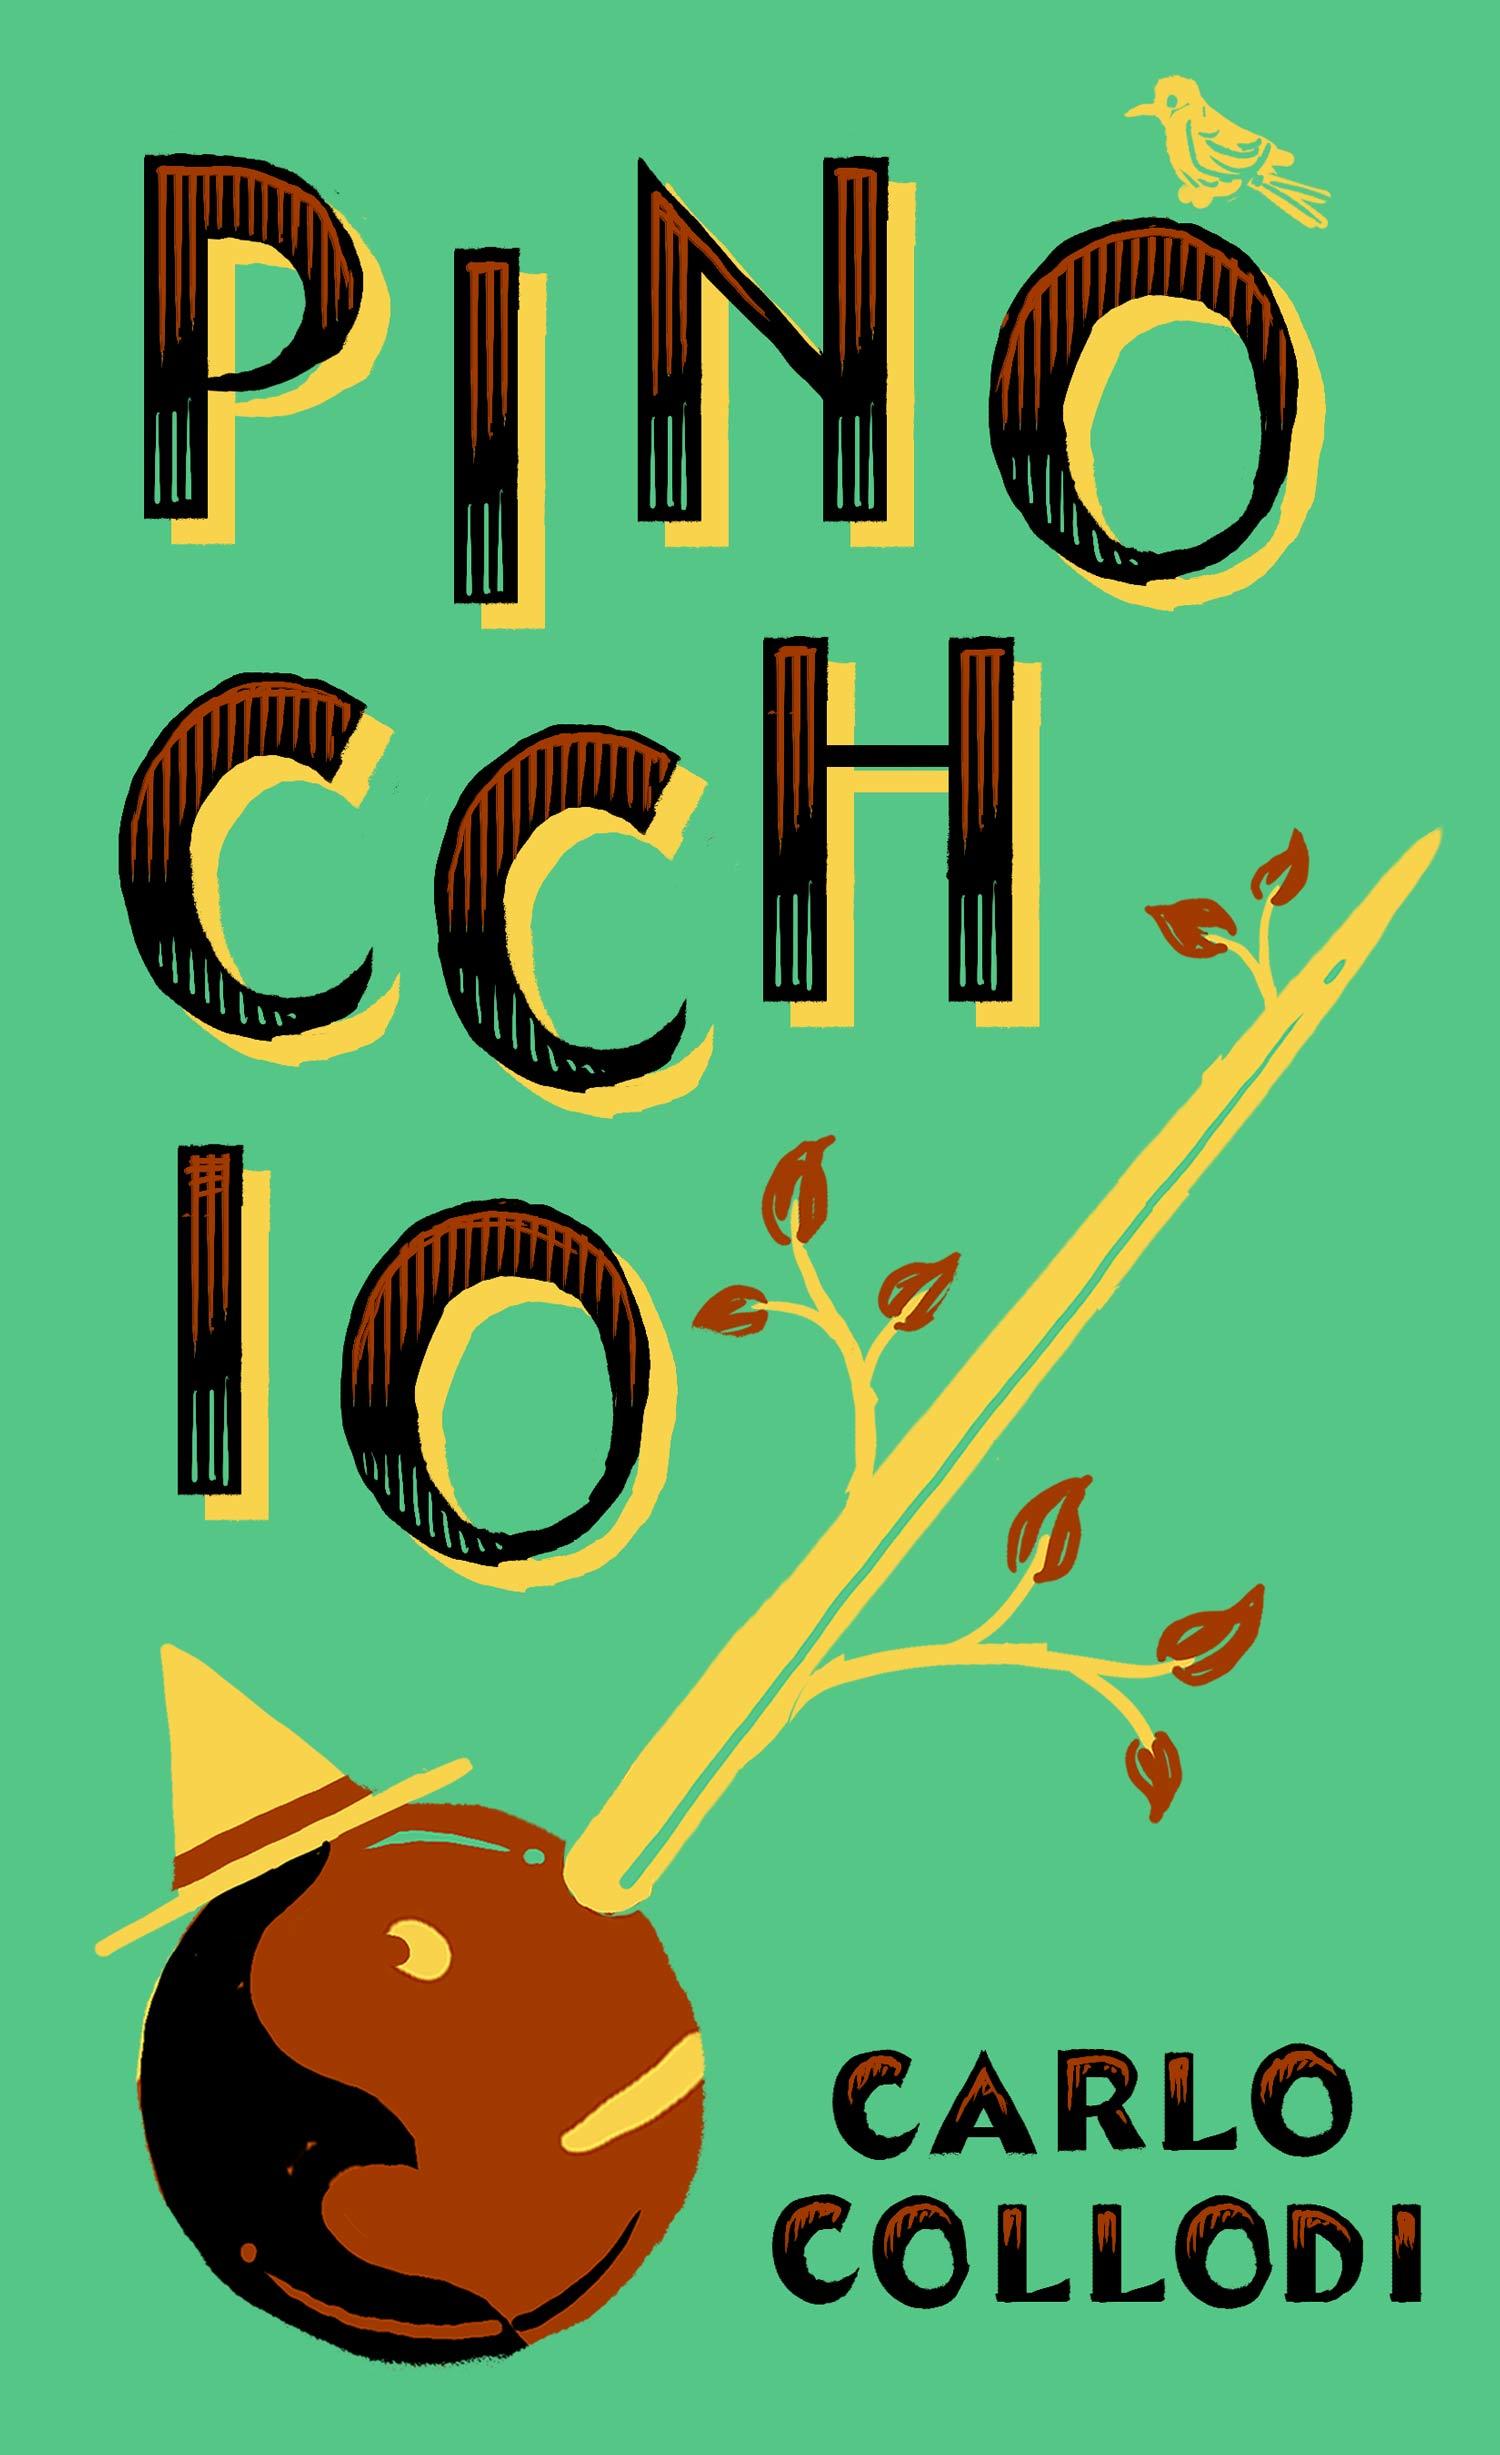 Pinocchio2.jpg